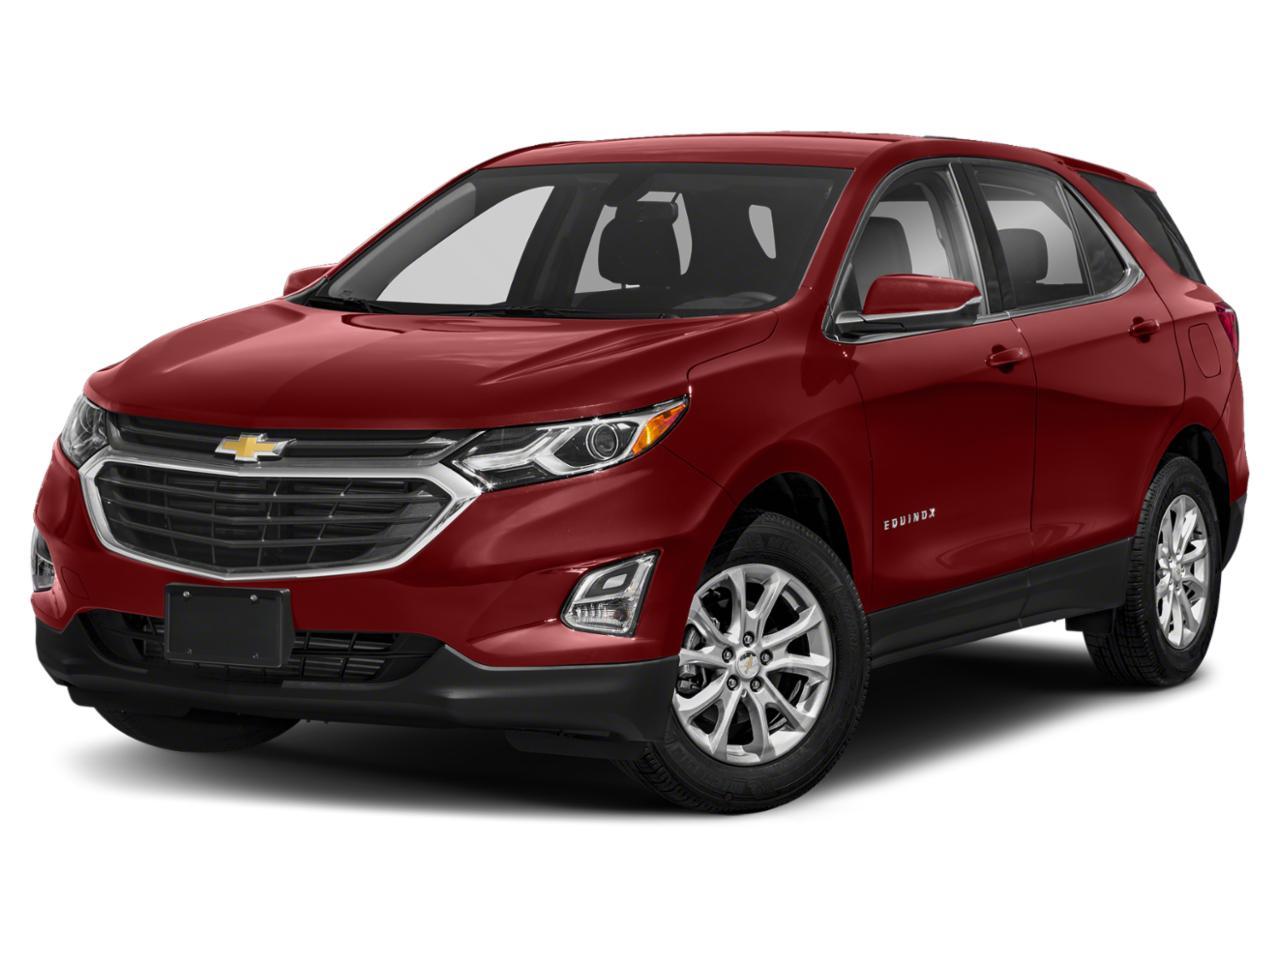 2020 Chevrolet Equinox Vehicle Photo in Neenah, WI 54956